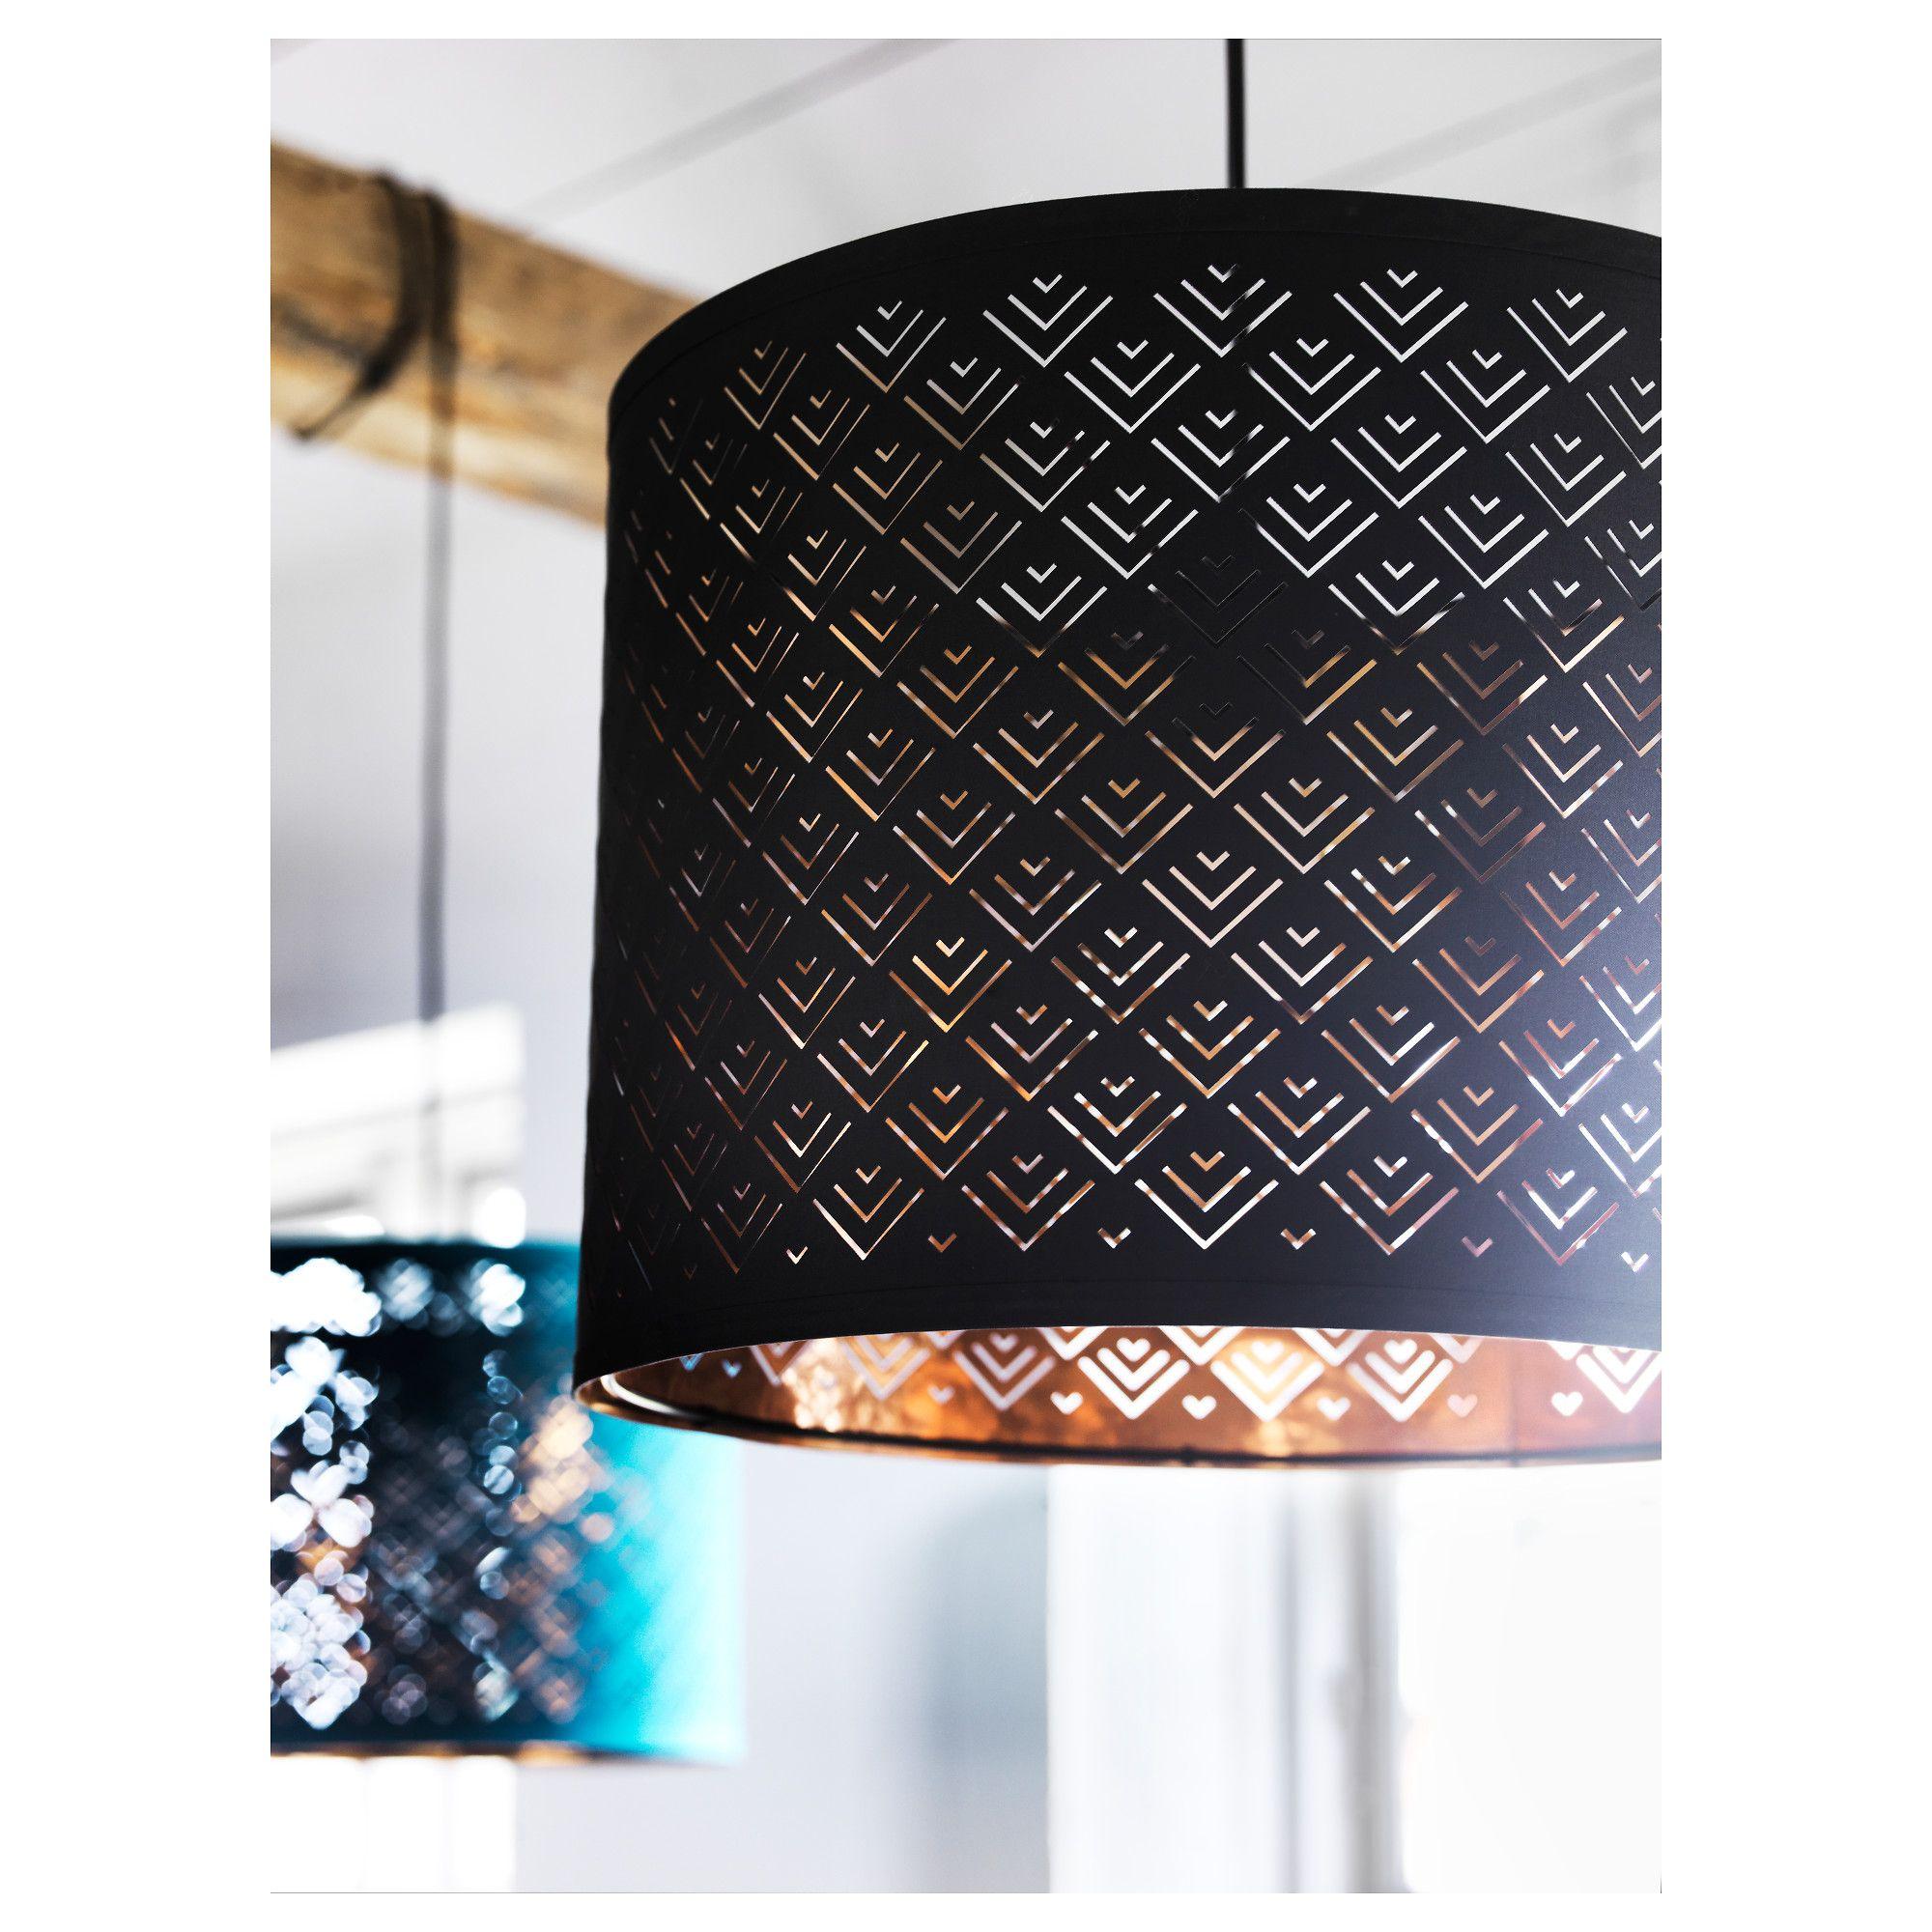 Lamp Shade Nymo Black Copper Colour Height 30 Cm Diameter 37 Cm